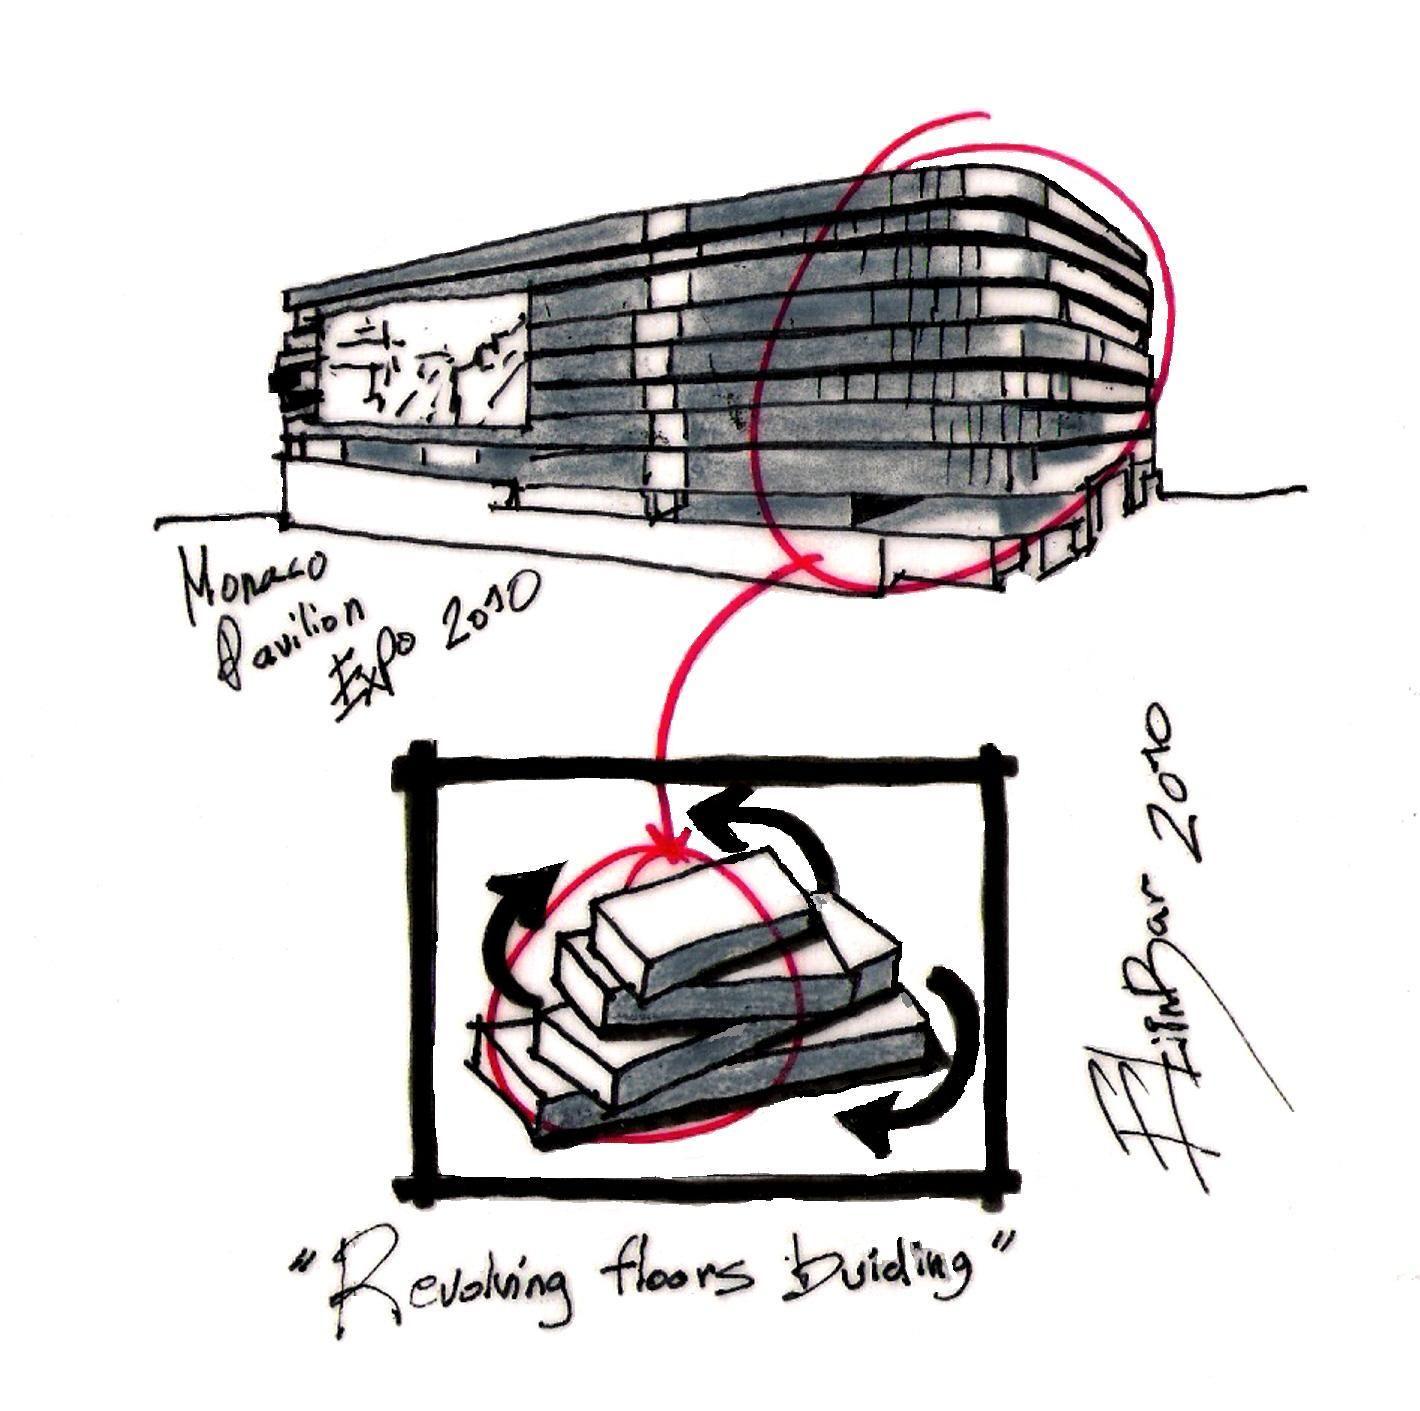 Zaha Hadid Design Concepts And Theory zaha hadid design concepts and theory - google search | заха хадид